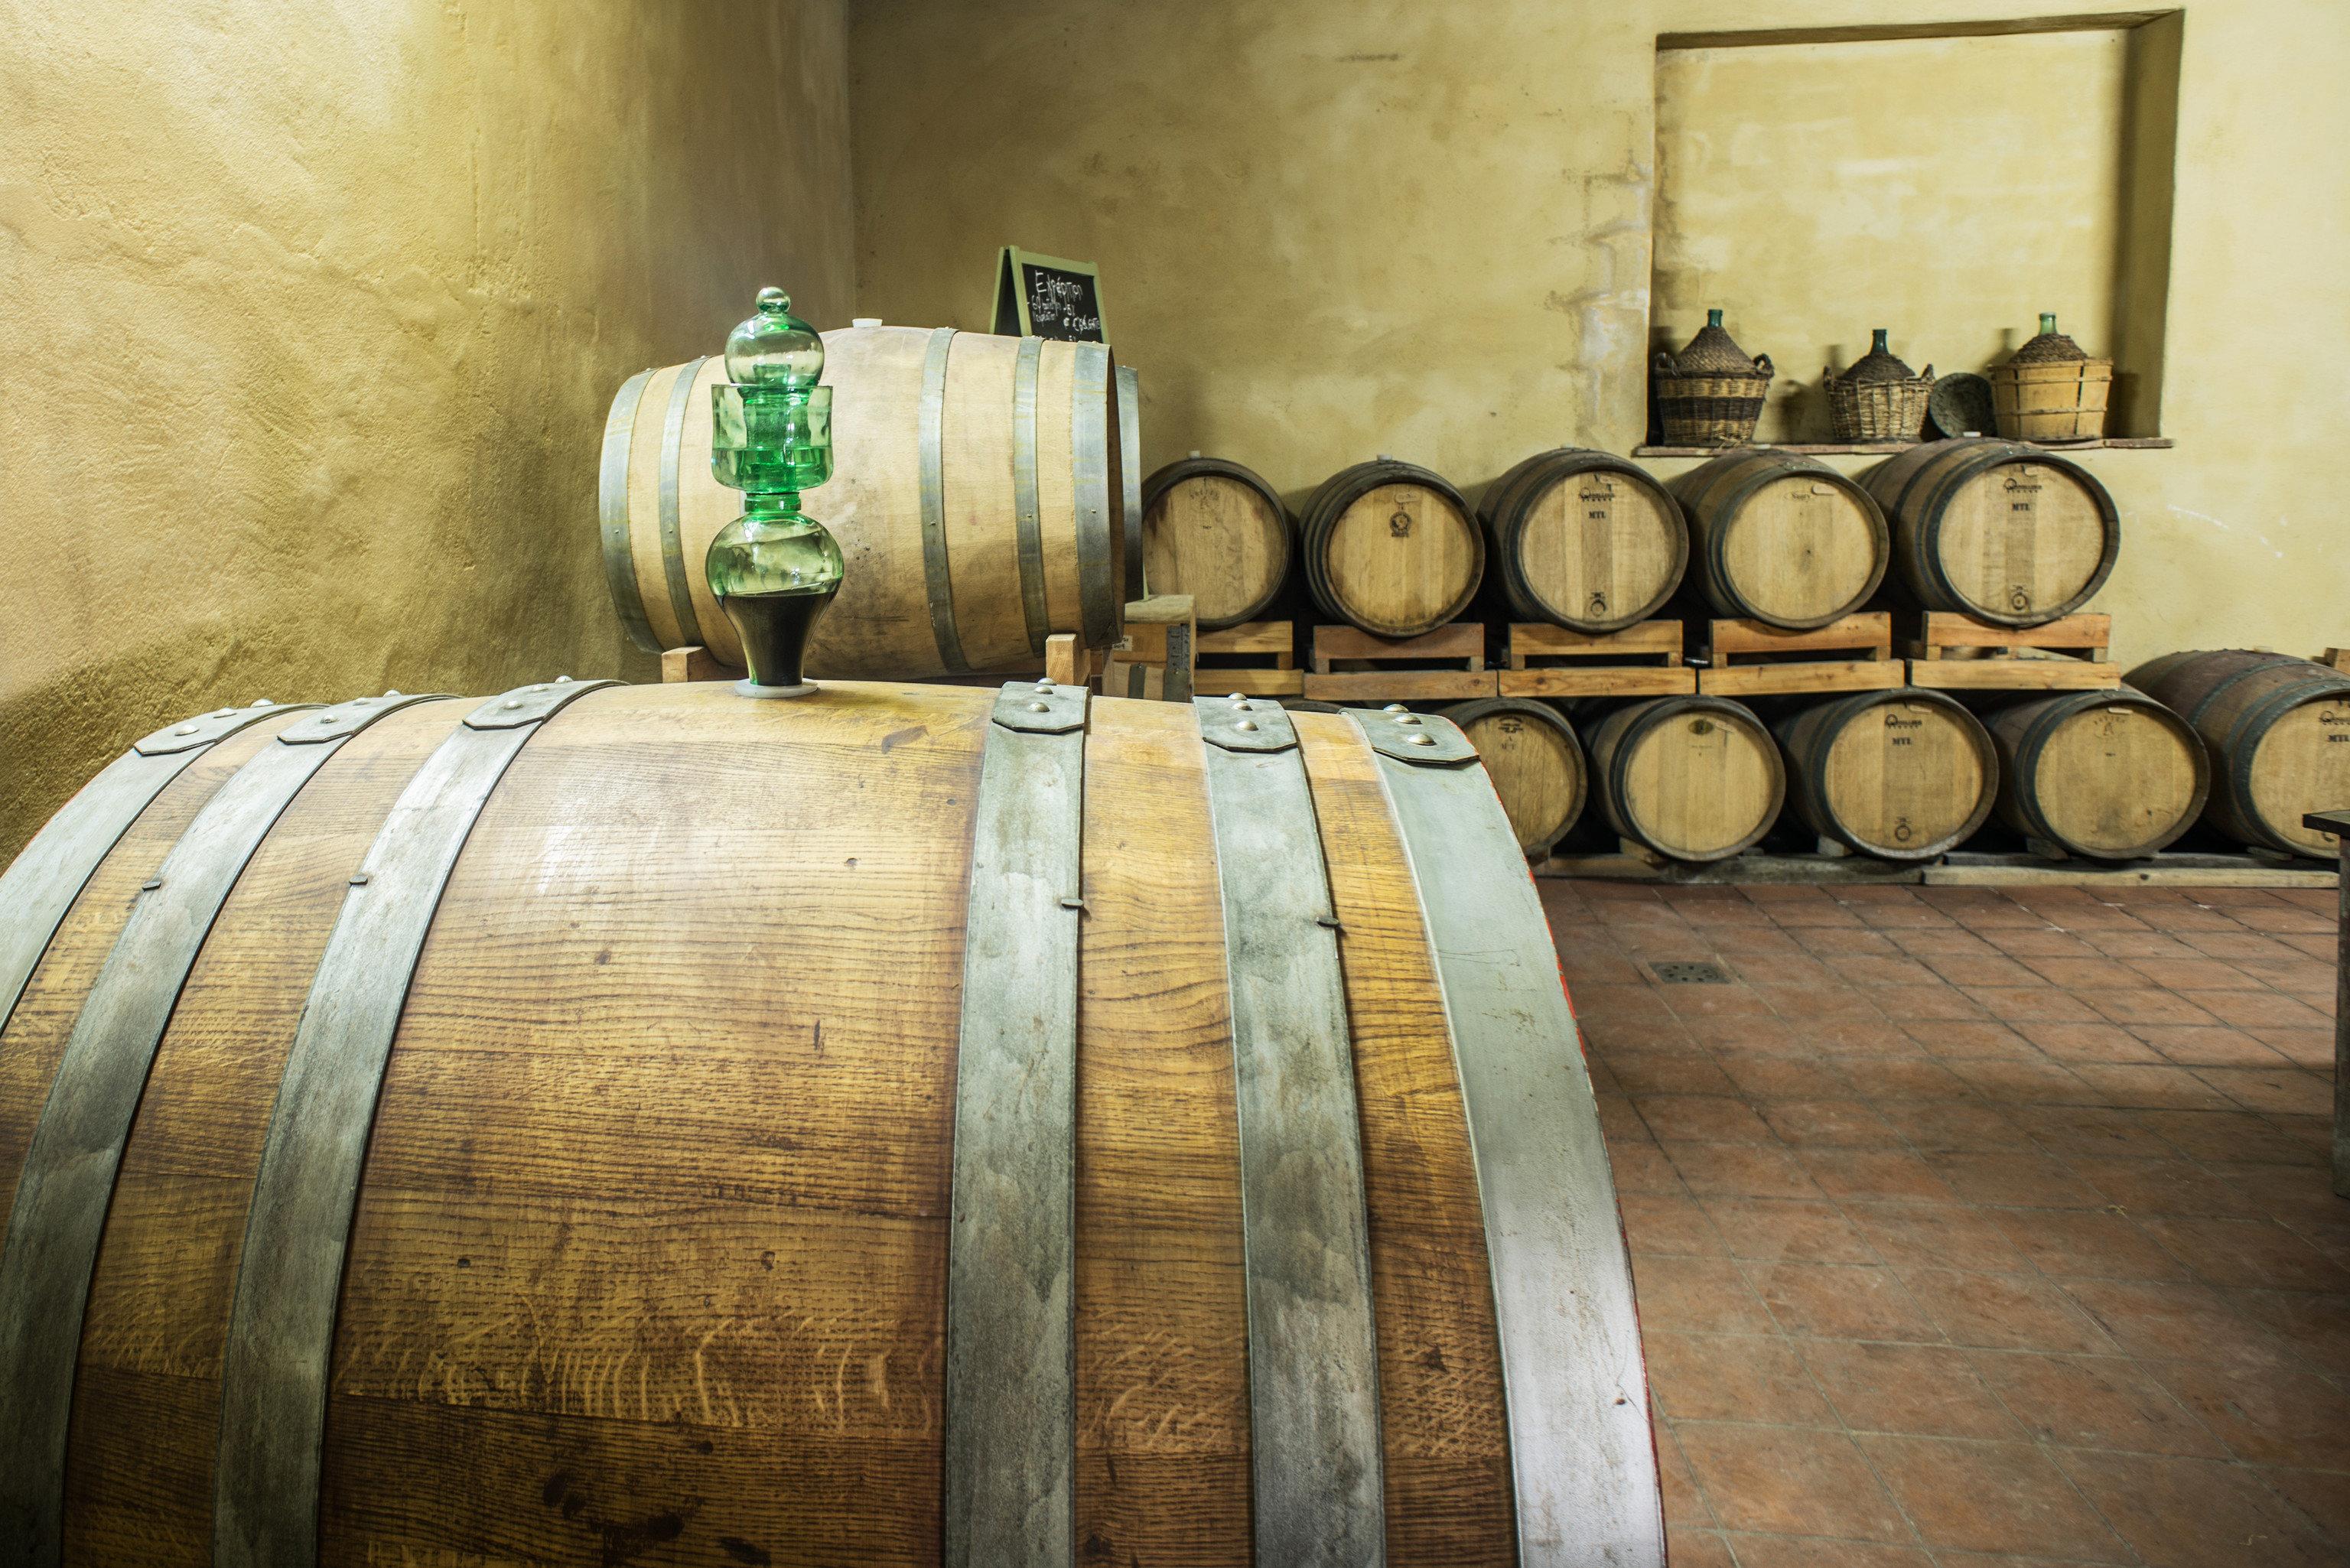 vessel barrel man made object basement wooden ancient history old